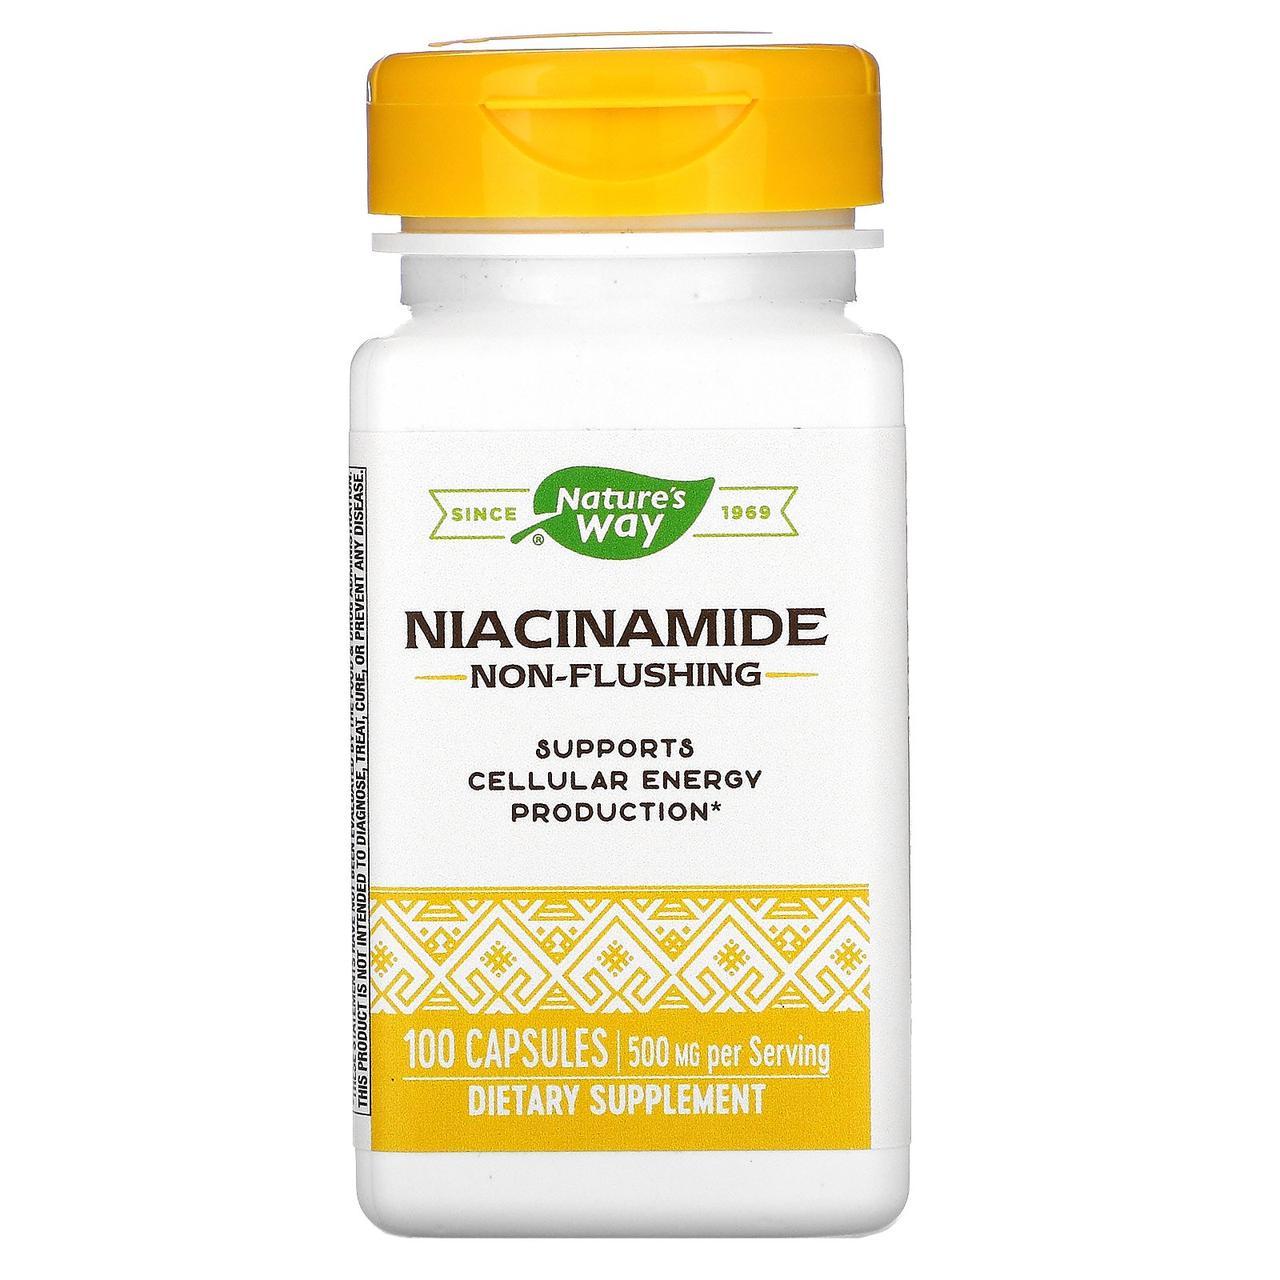 Вітамін В3, nature's Way, 500 мг, 100 капсул